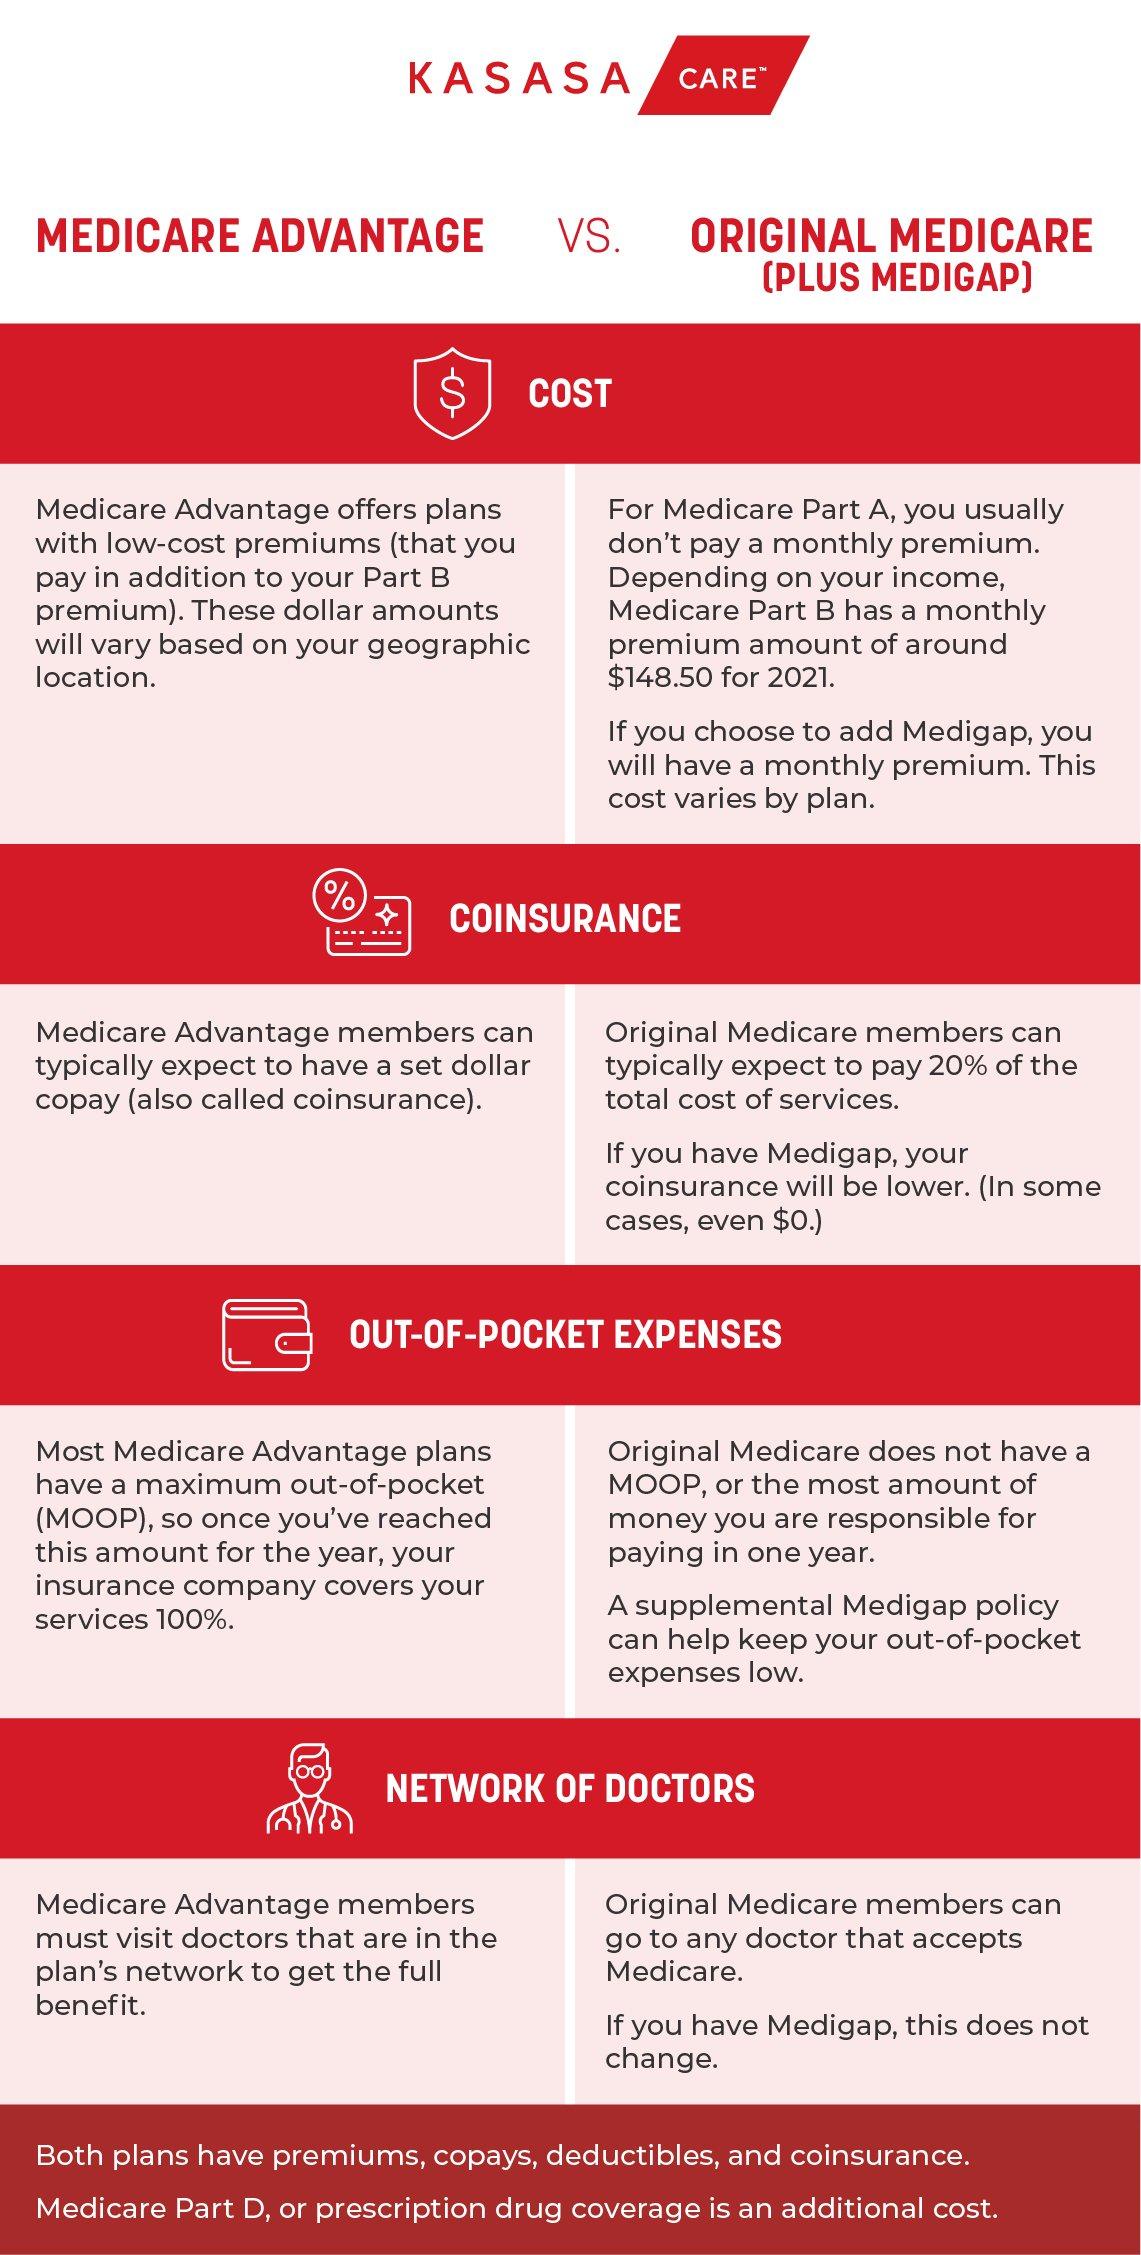 Kasasa_Care_Medicare_Comparison_Chart